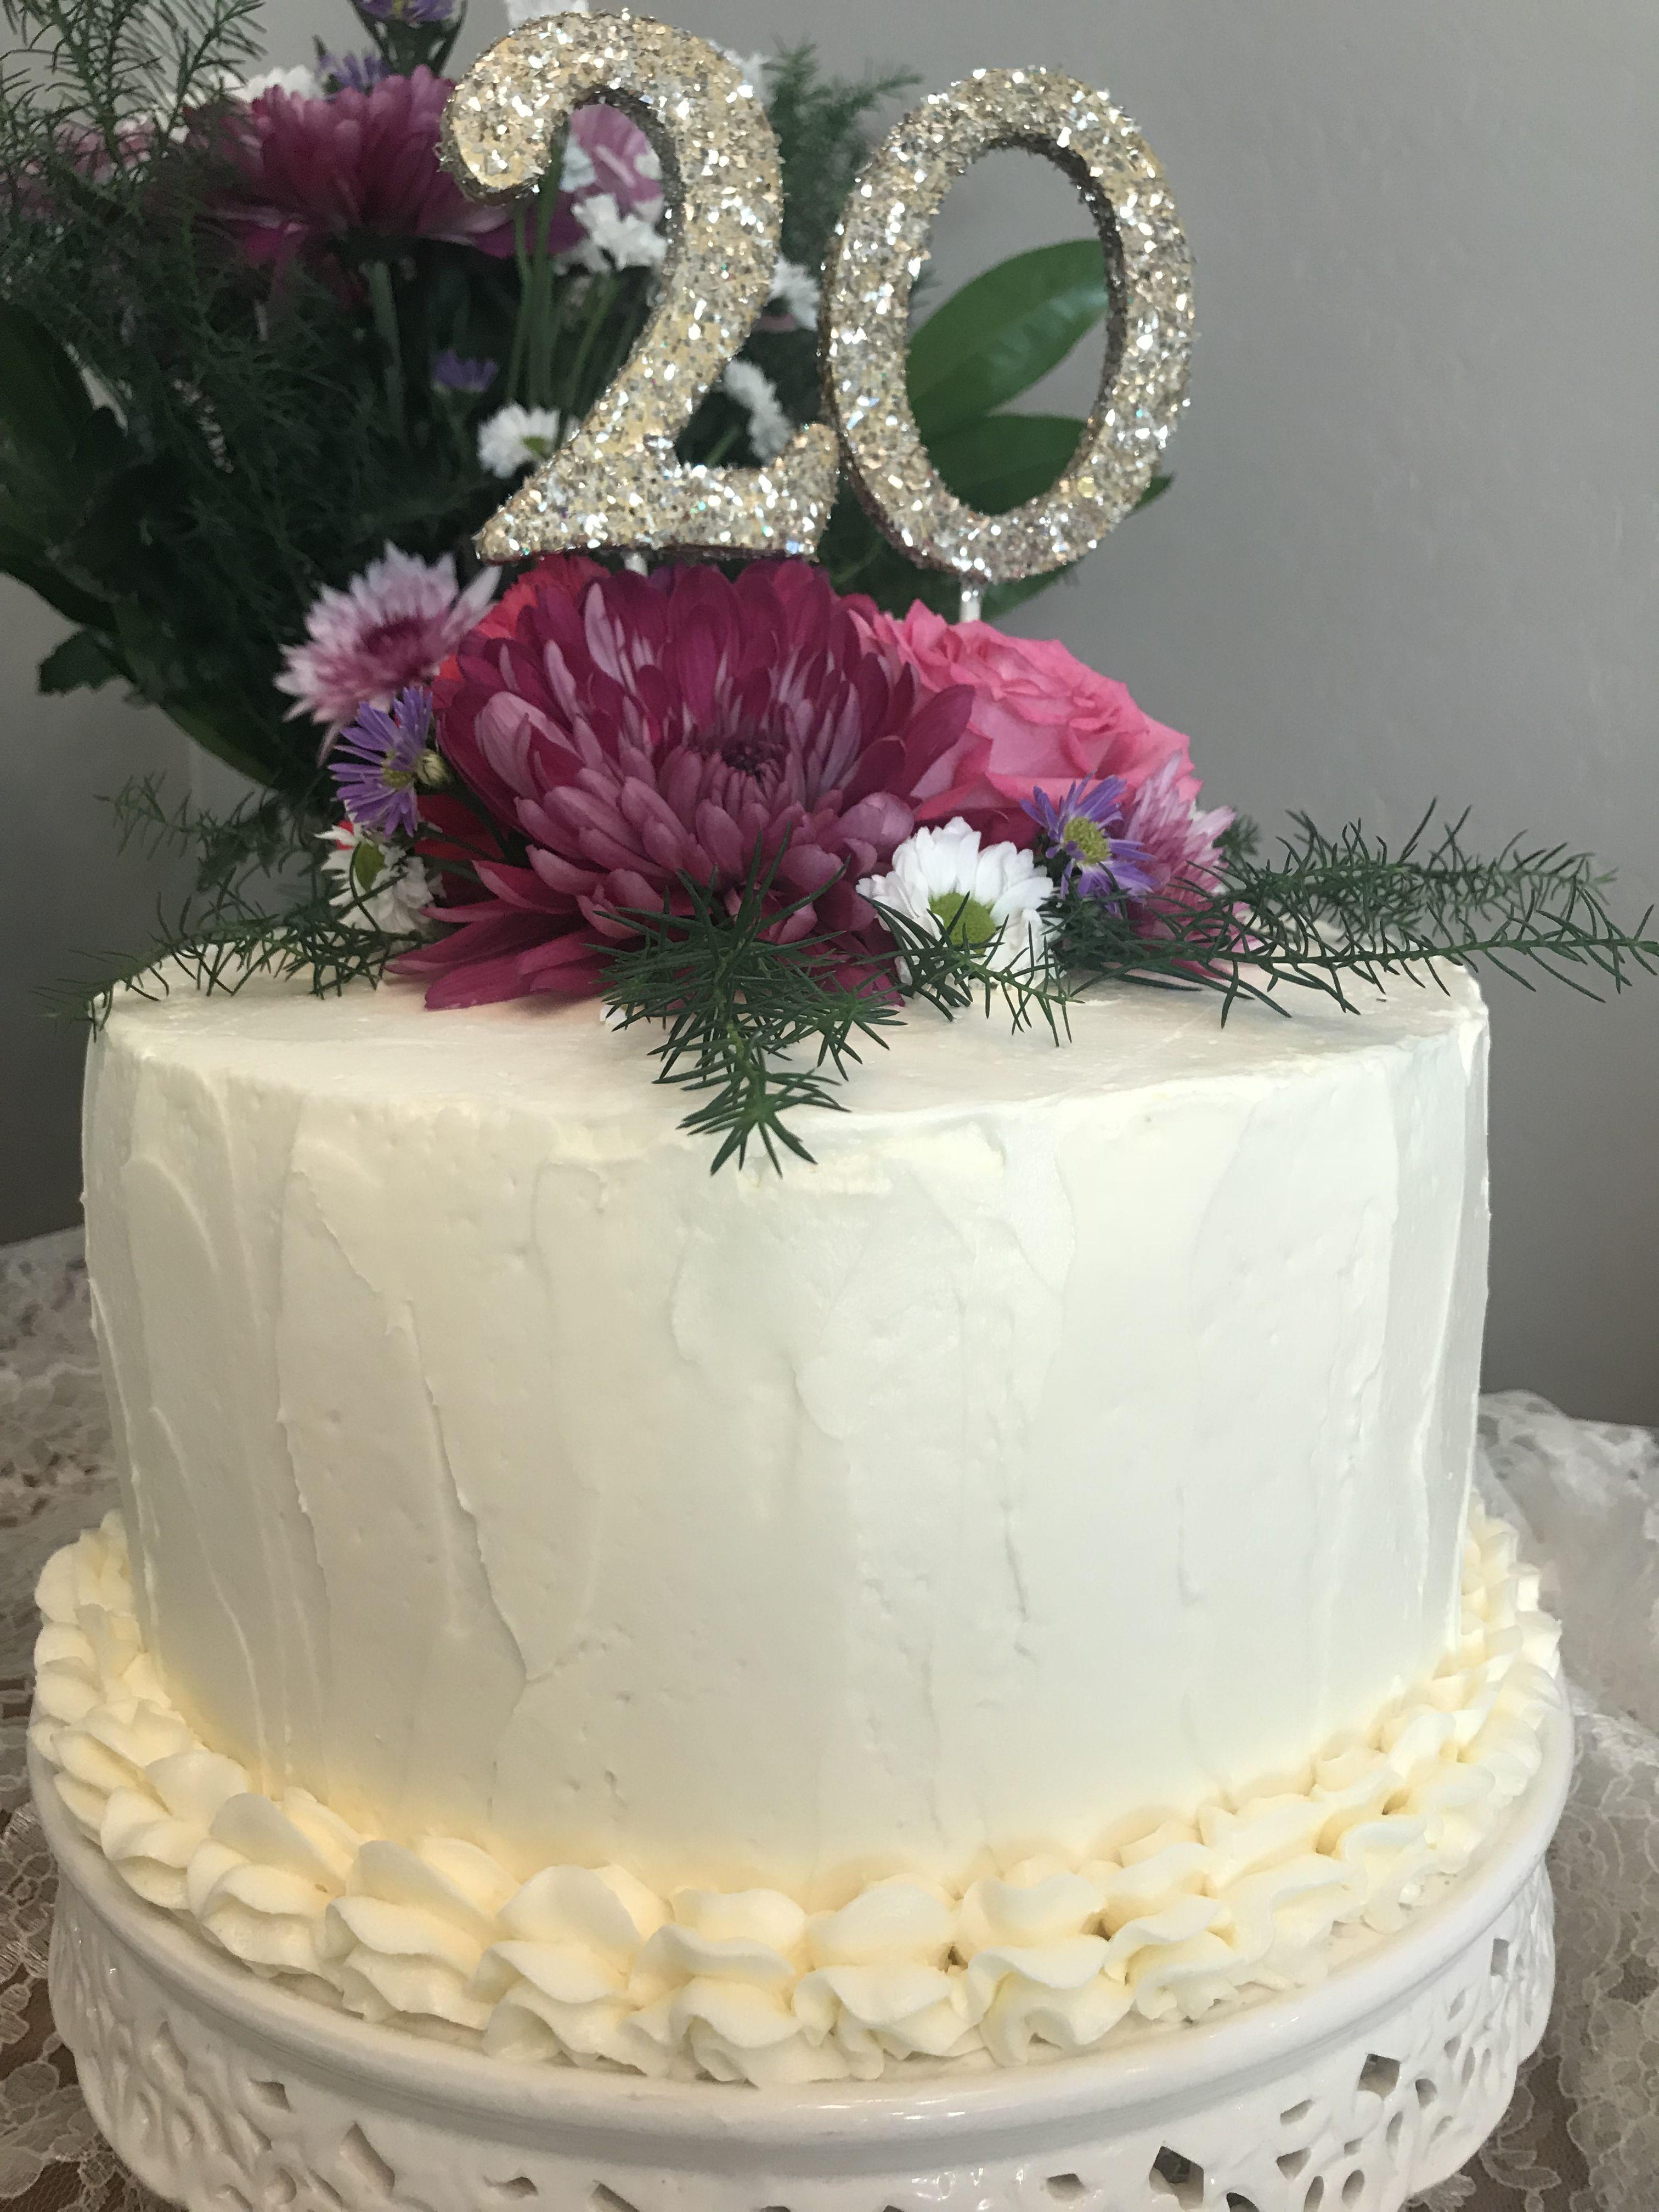 20 Year Anniversary Cake For Friends Amaretto Raspberry Cream